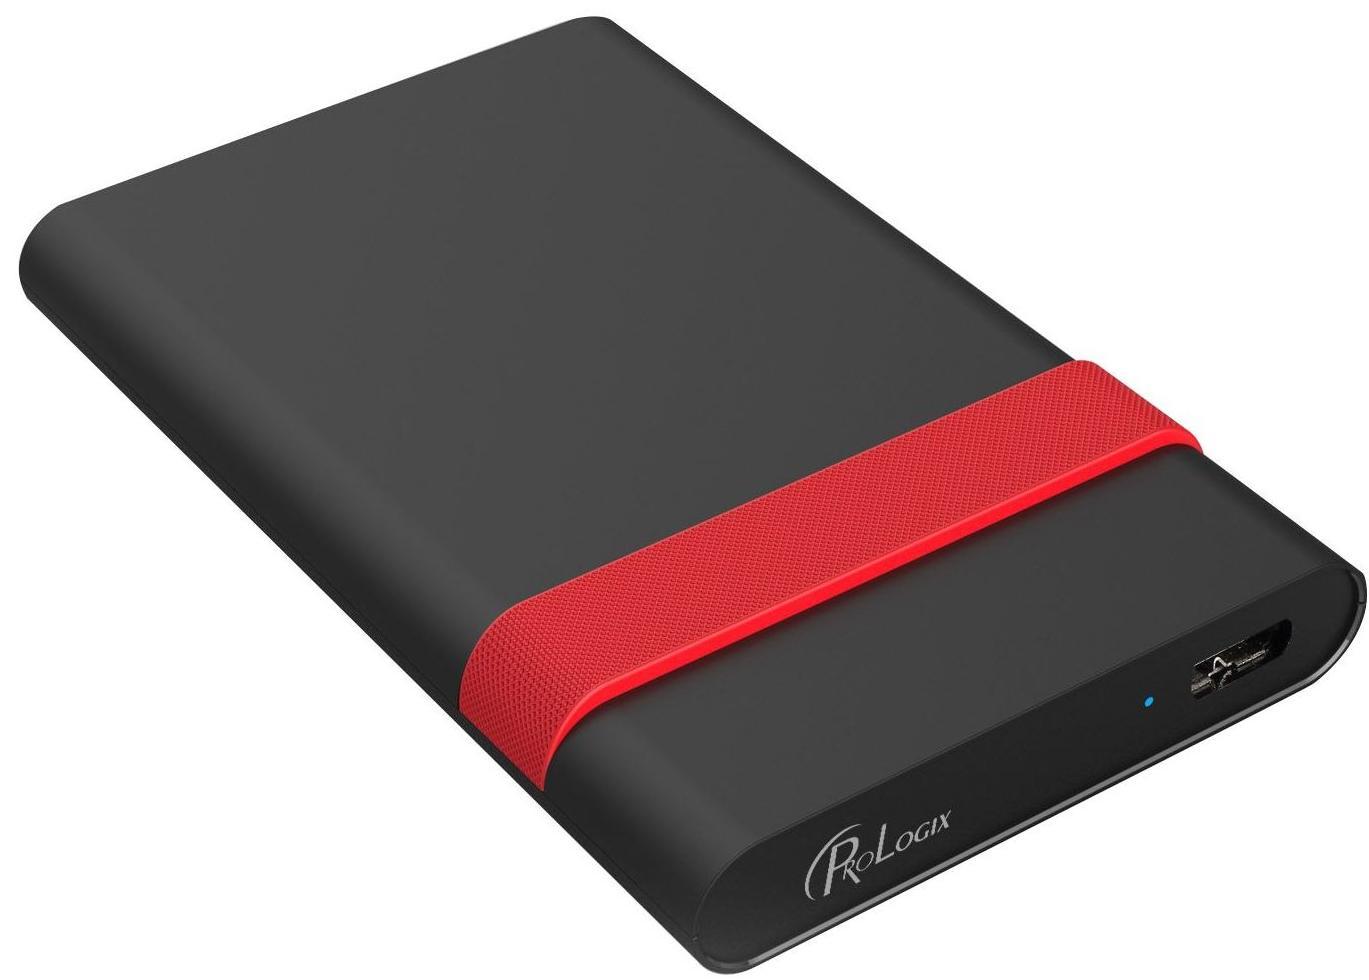 Купить Кишеня зовнішня ProLogix PMR-GD2530-3.0-Black